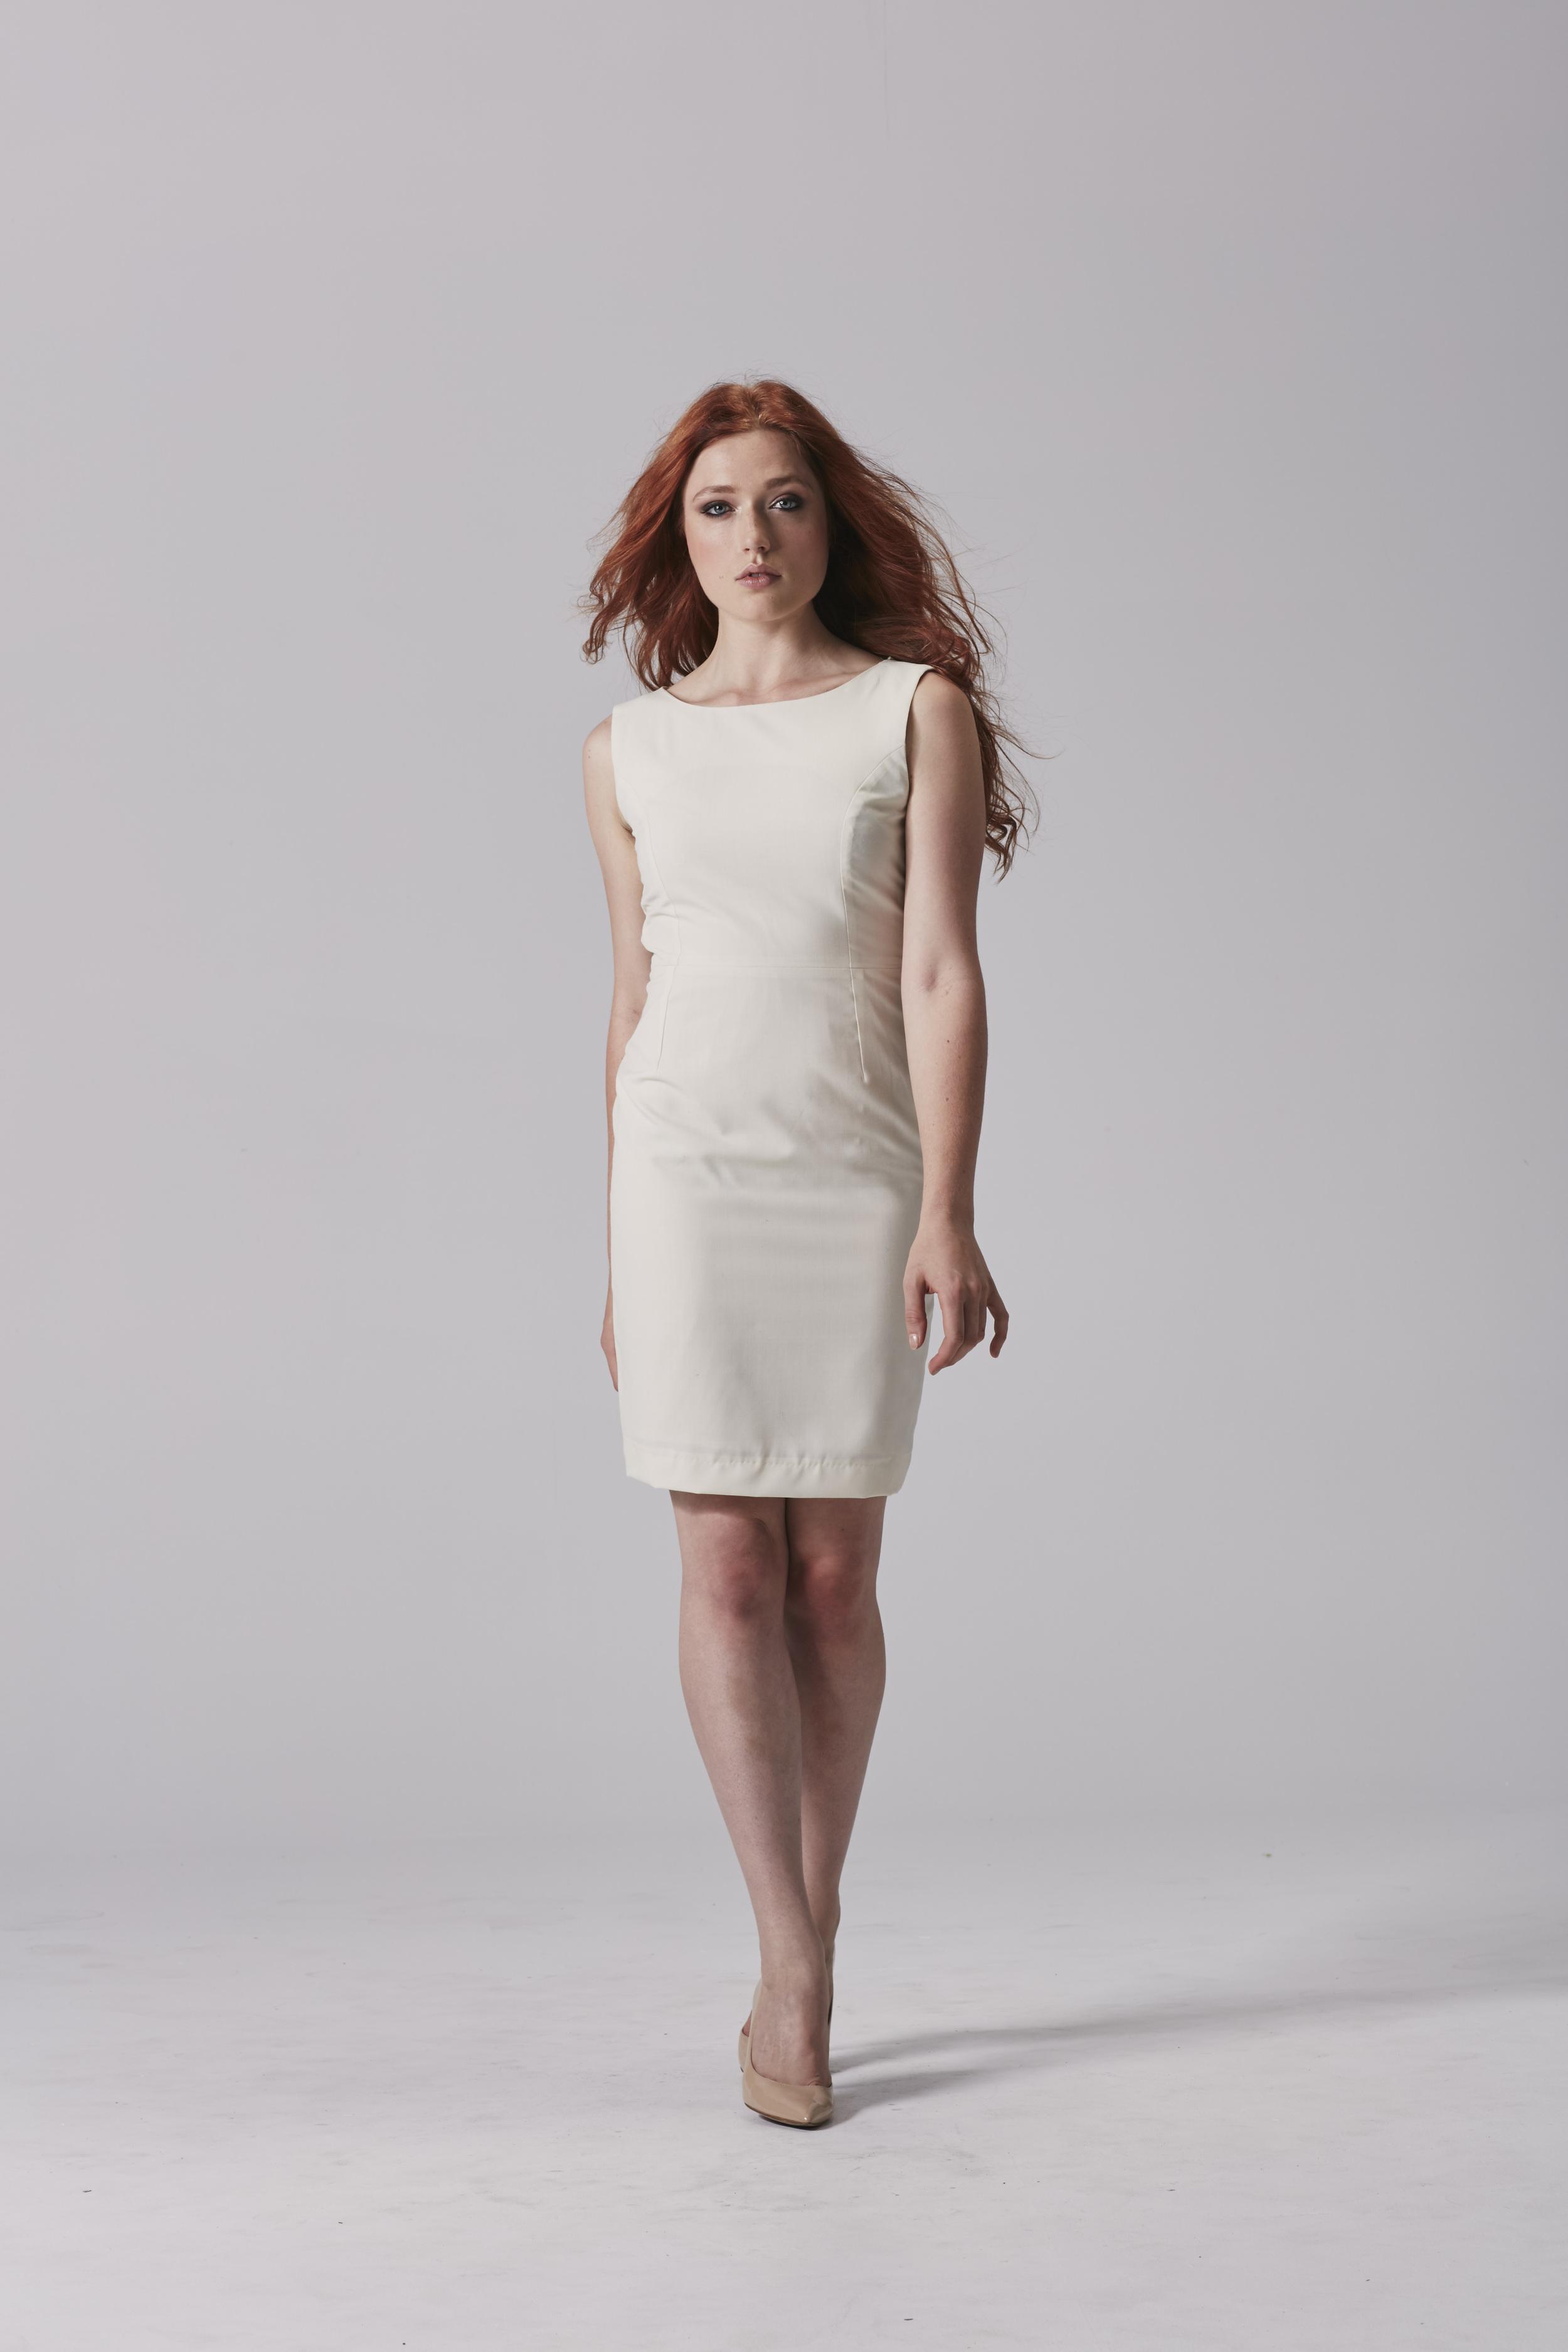 Womens white business dress.jpg